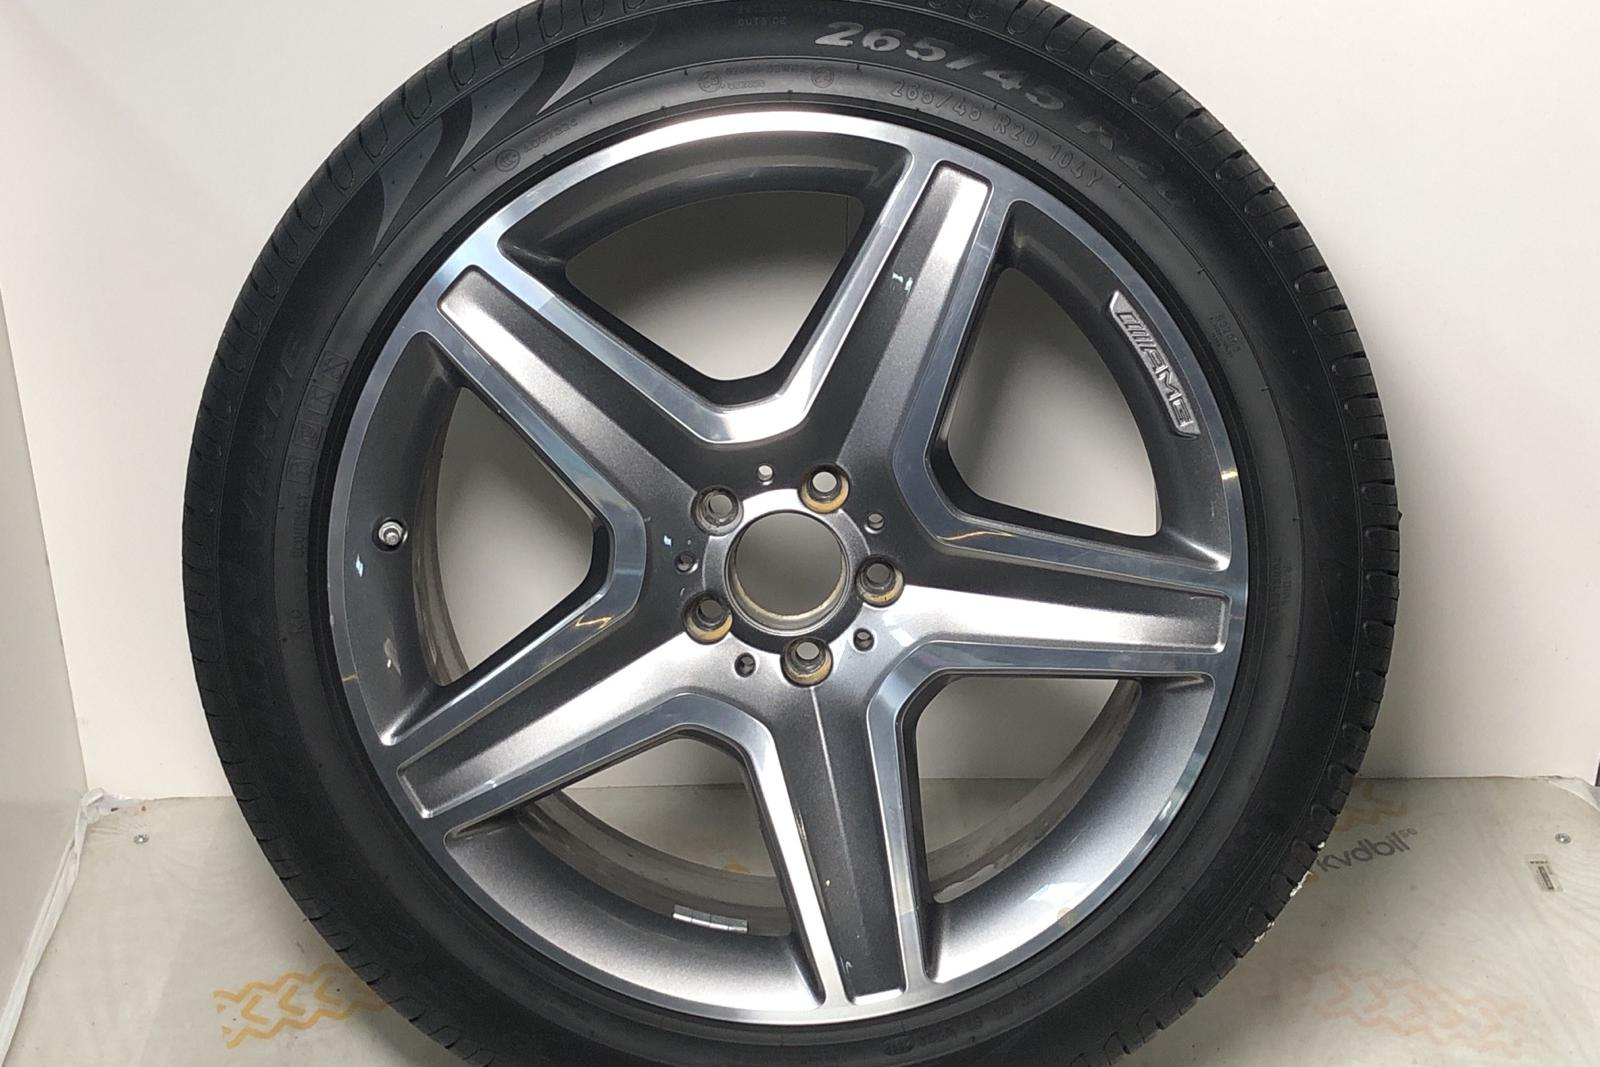 Mercedes GLE 350 d 4MATIC W166 (258hk) - 5 713 mil - Automat - svart - 2018